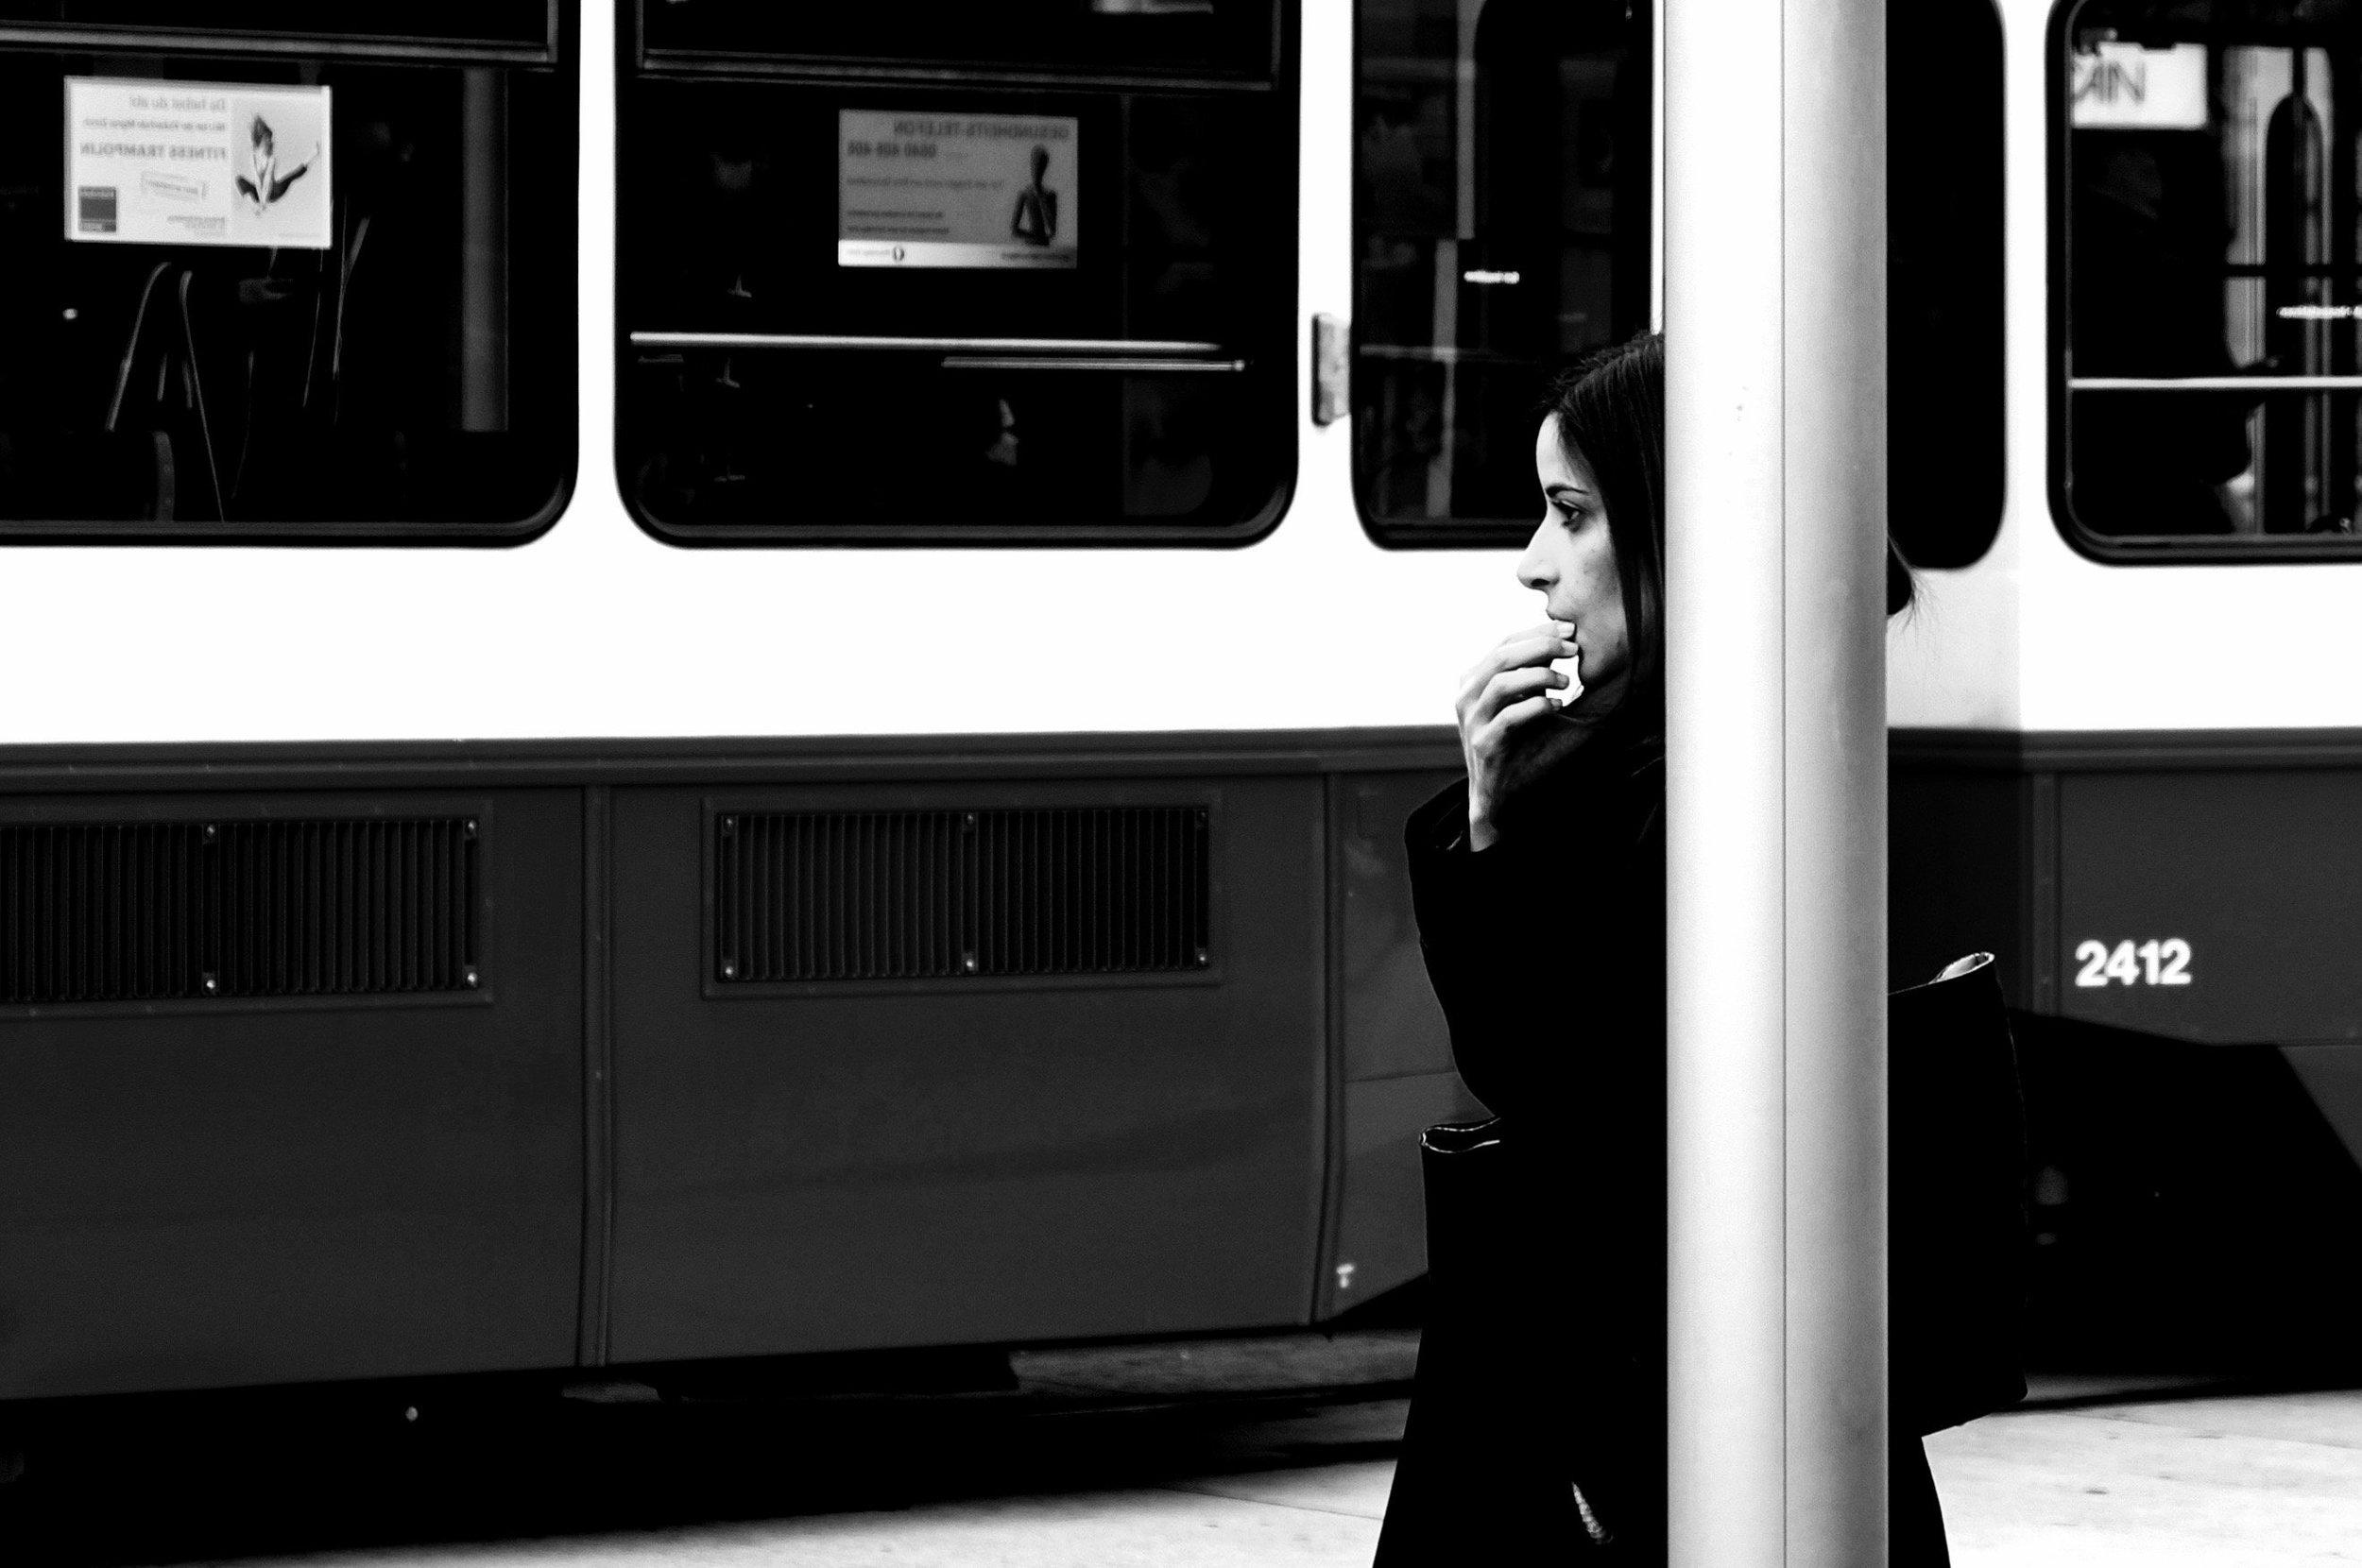 street_photography_24.jpg